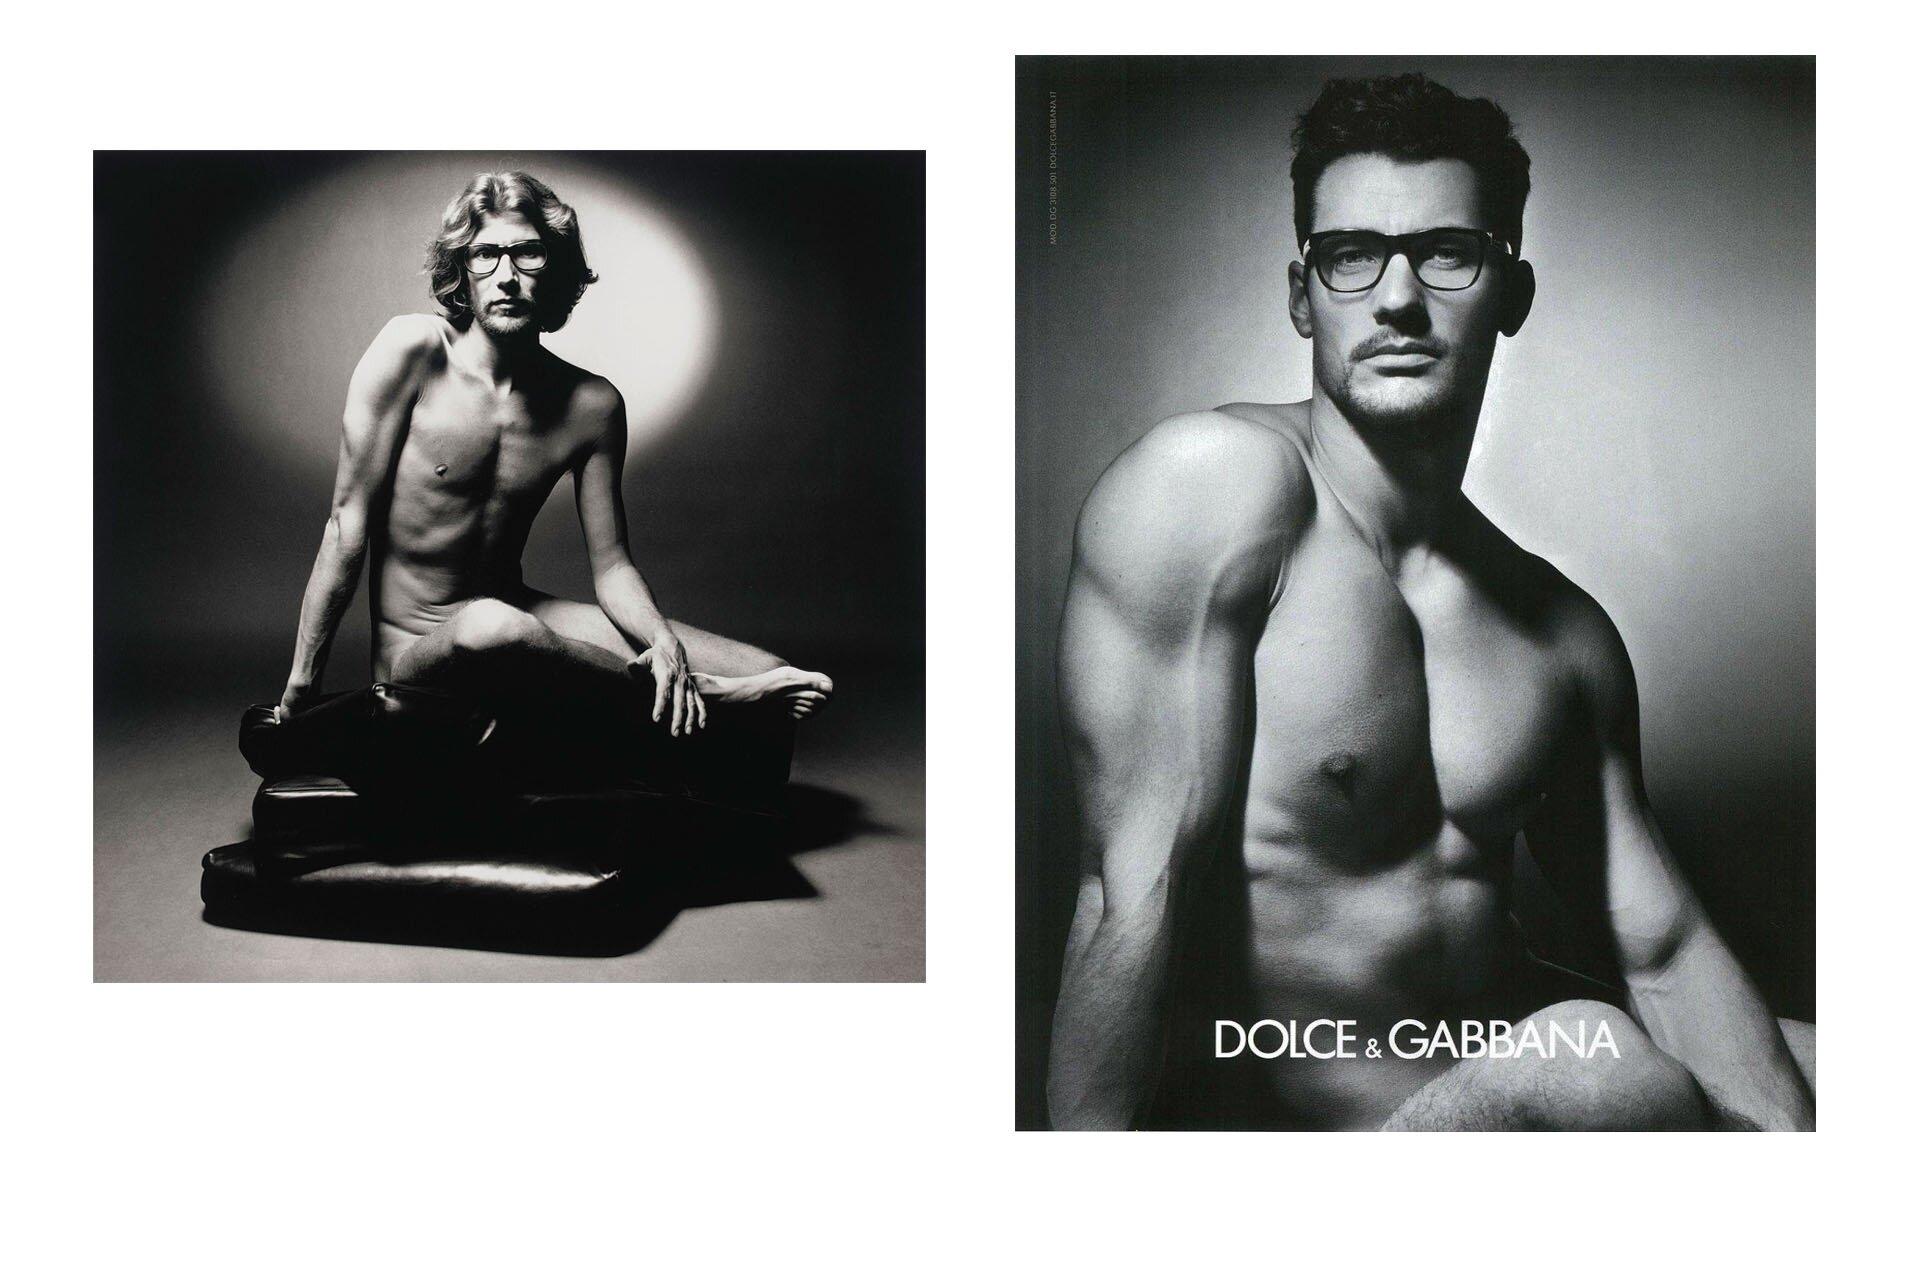 Yves Saint Laurent, Najsłynniejsi projektanci, Francuska moda, Haute Couture, David Gandy